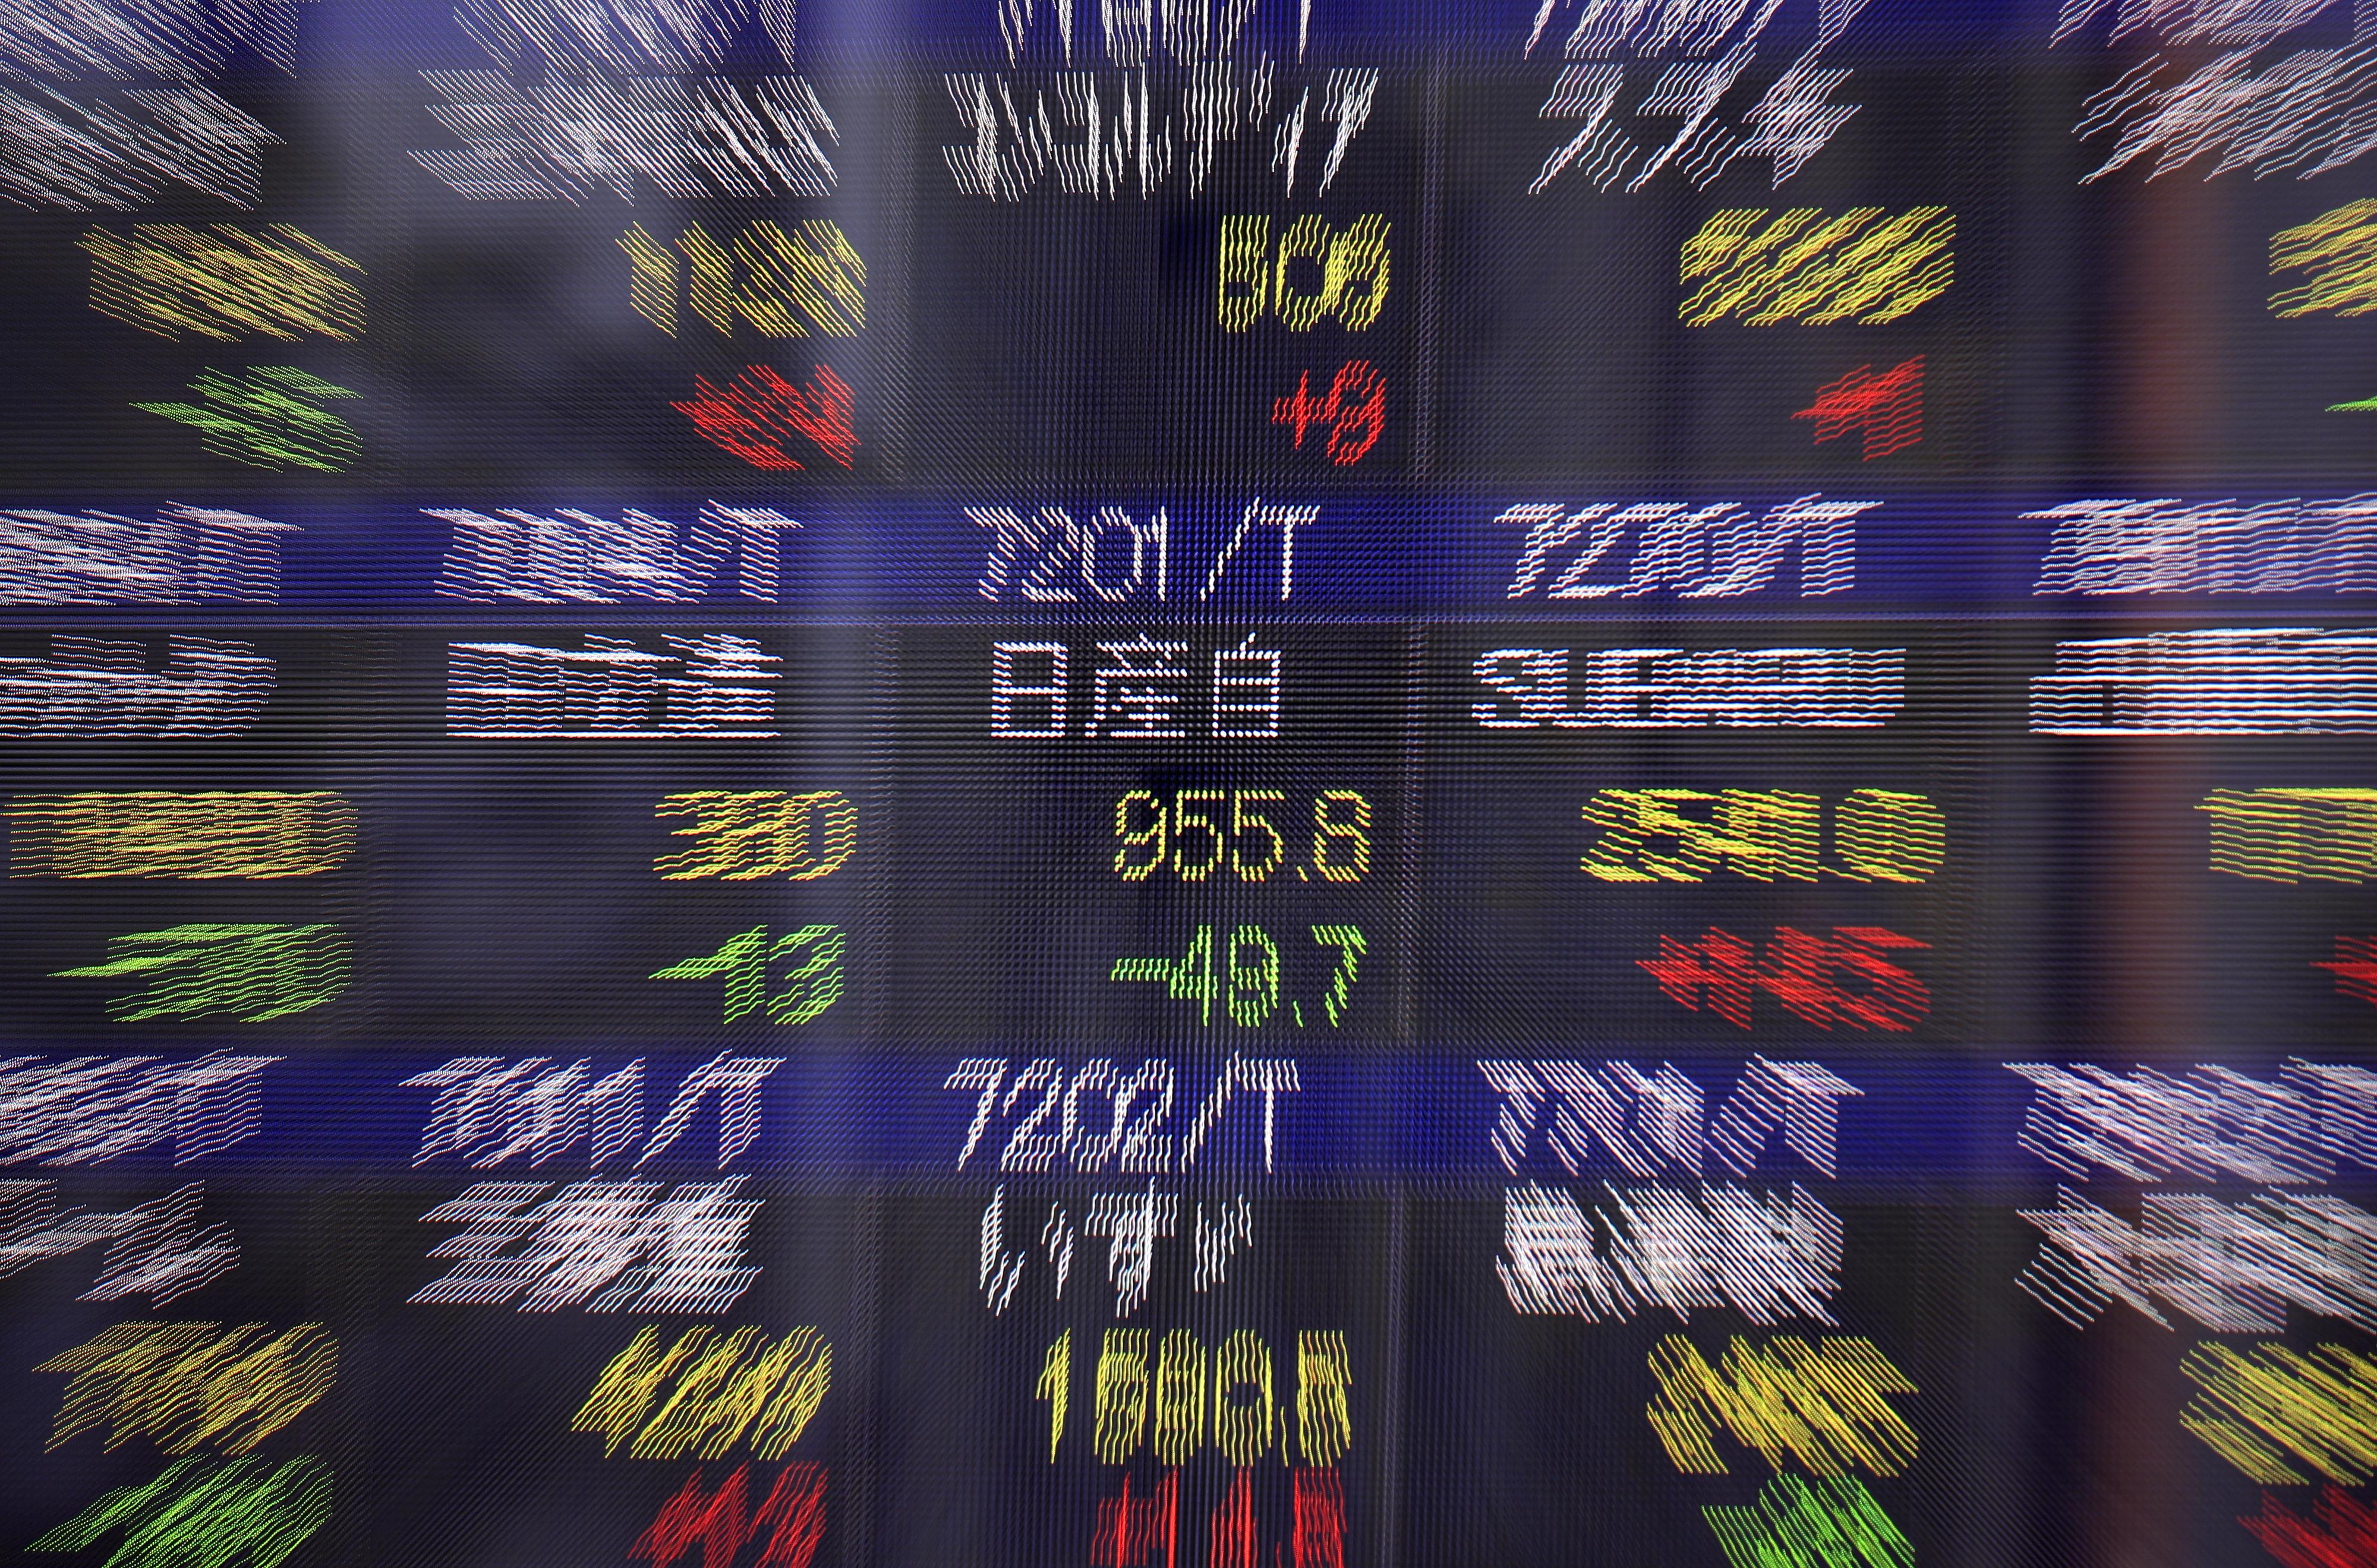 Bolsa de Tóquio sobe 0,14% no fecho